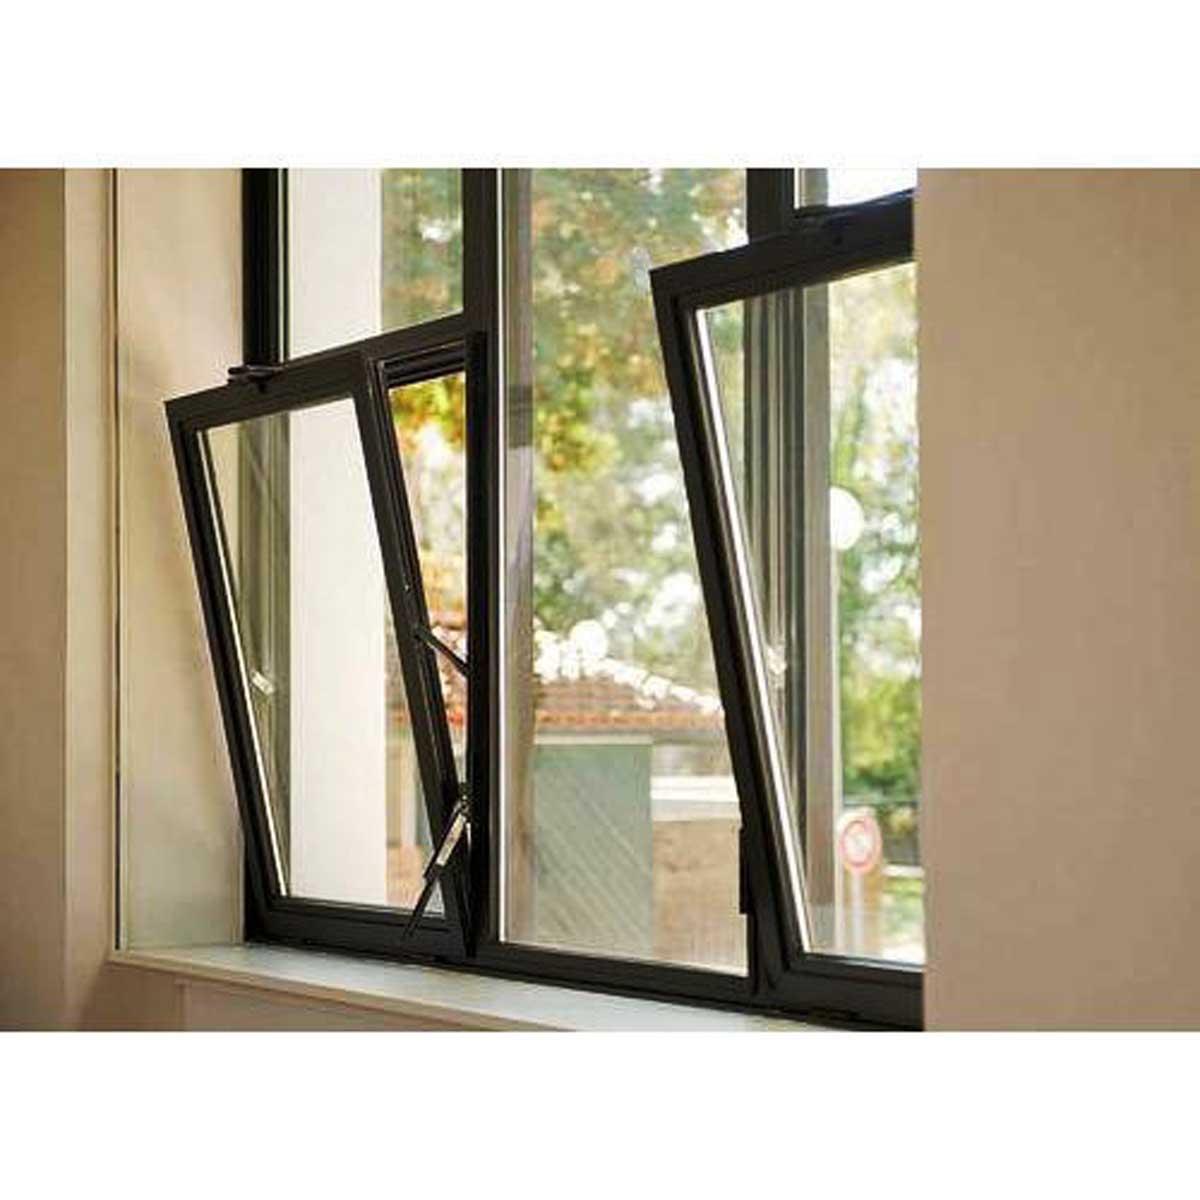 Top Hung Window (2)